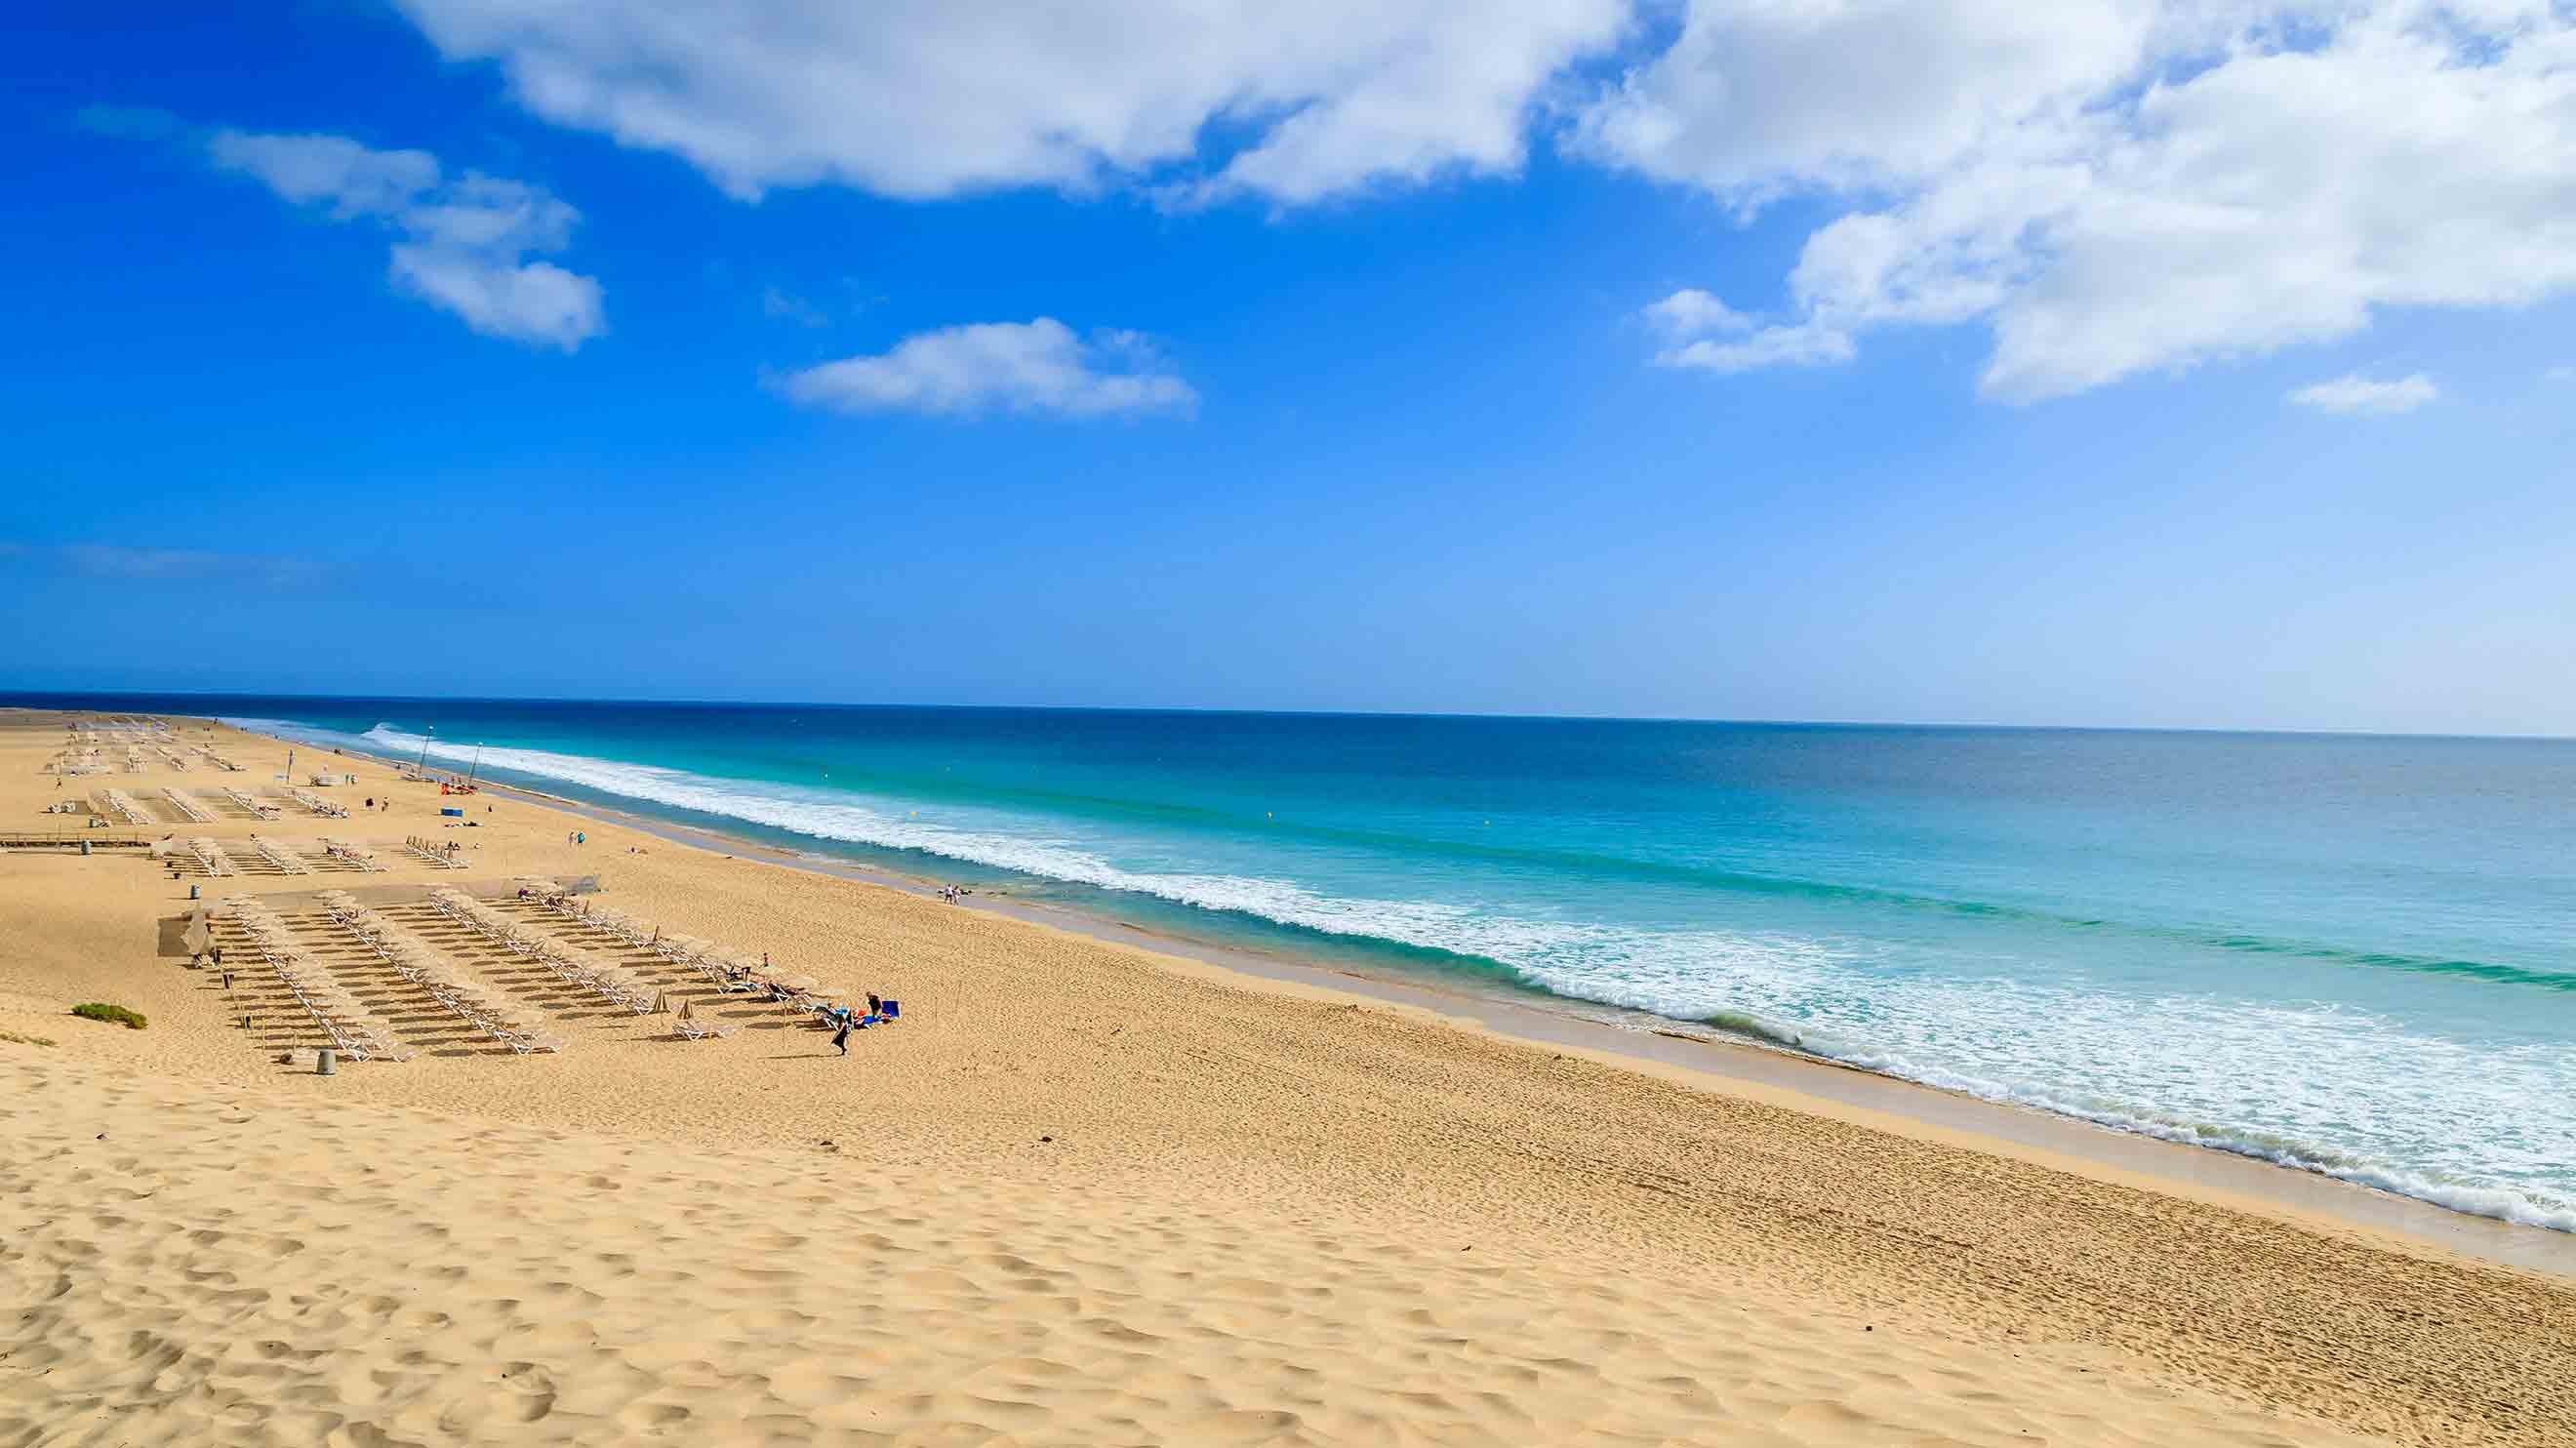 649 hoteles en fuerteventura baratos con - Hoteles con encanto en fuerteventura ...